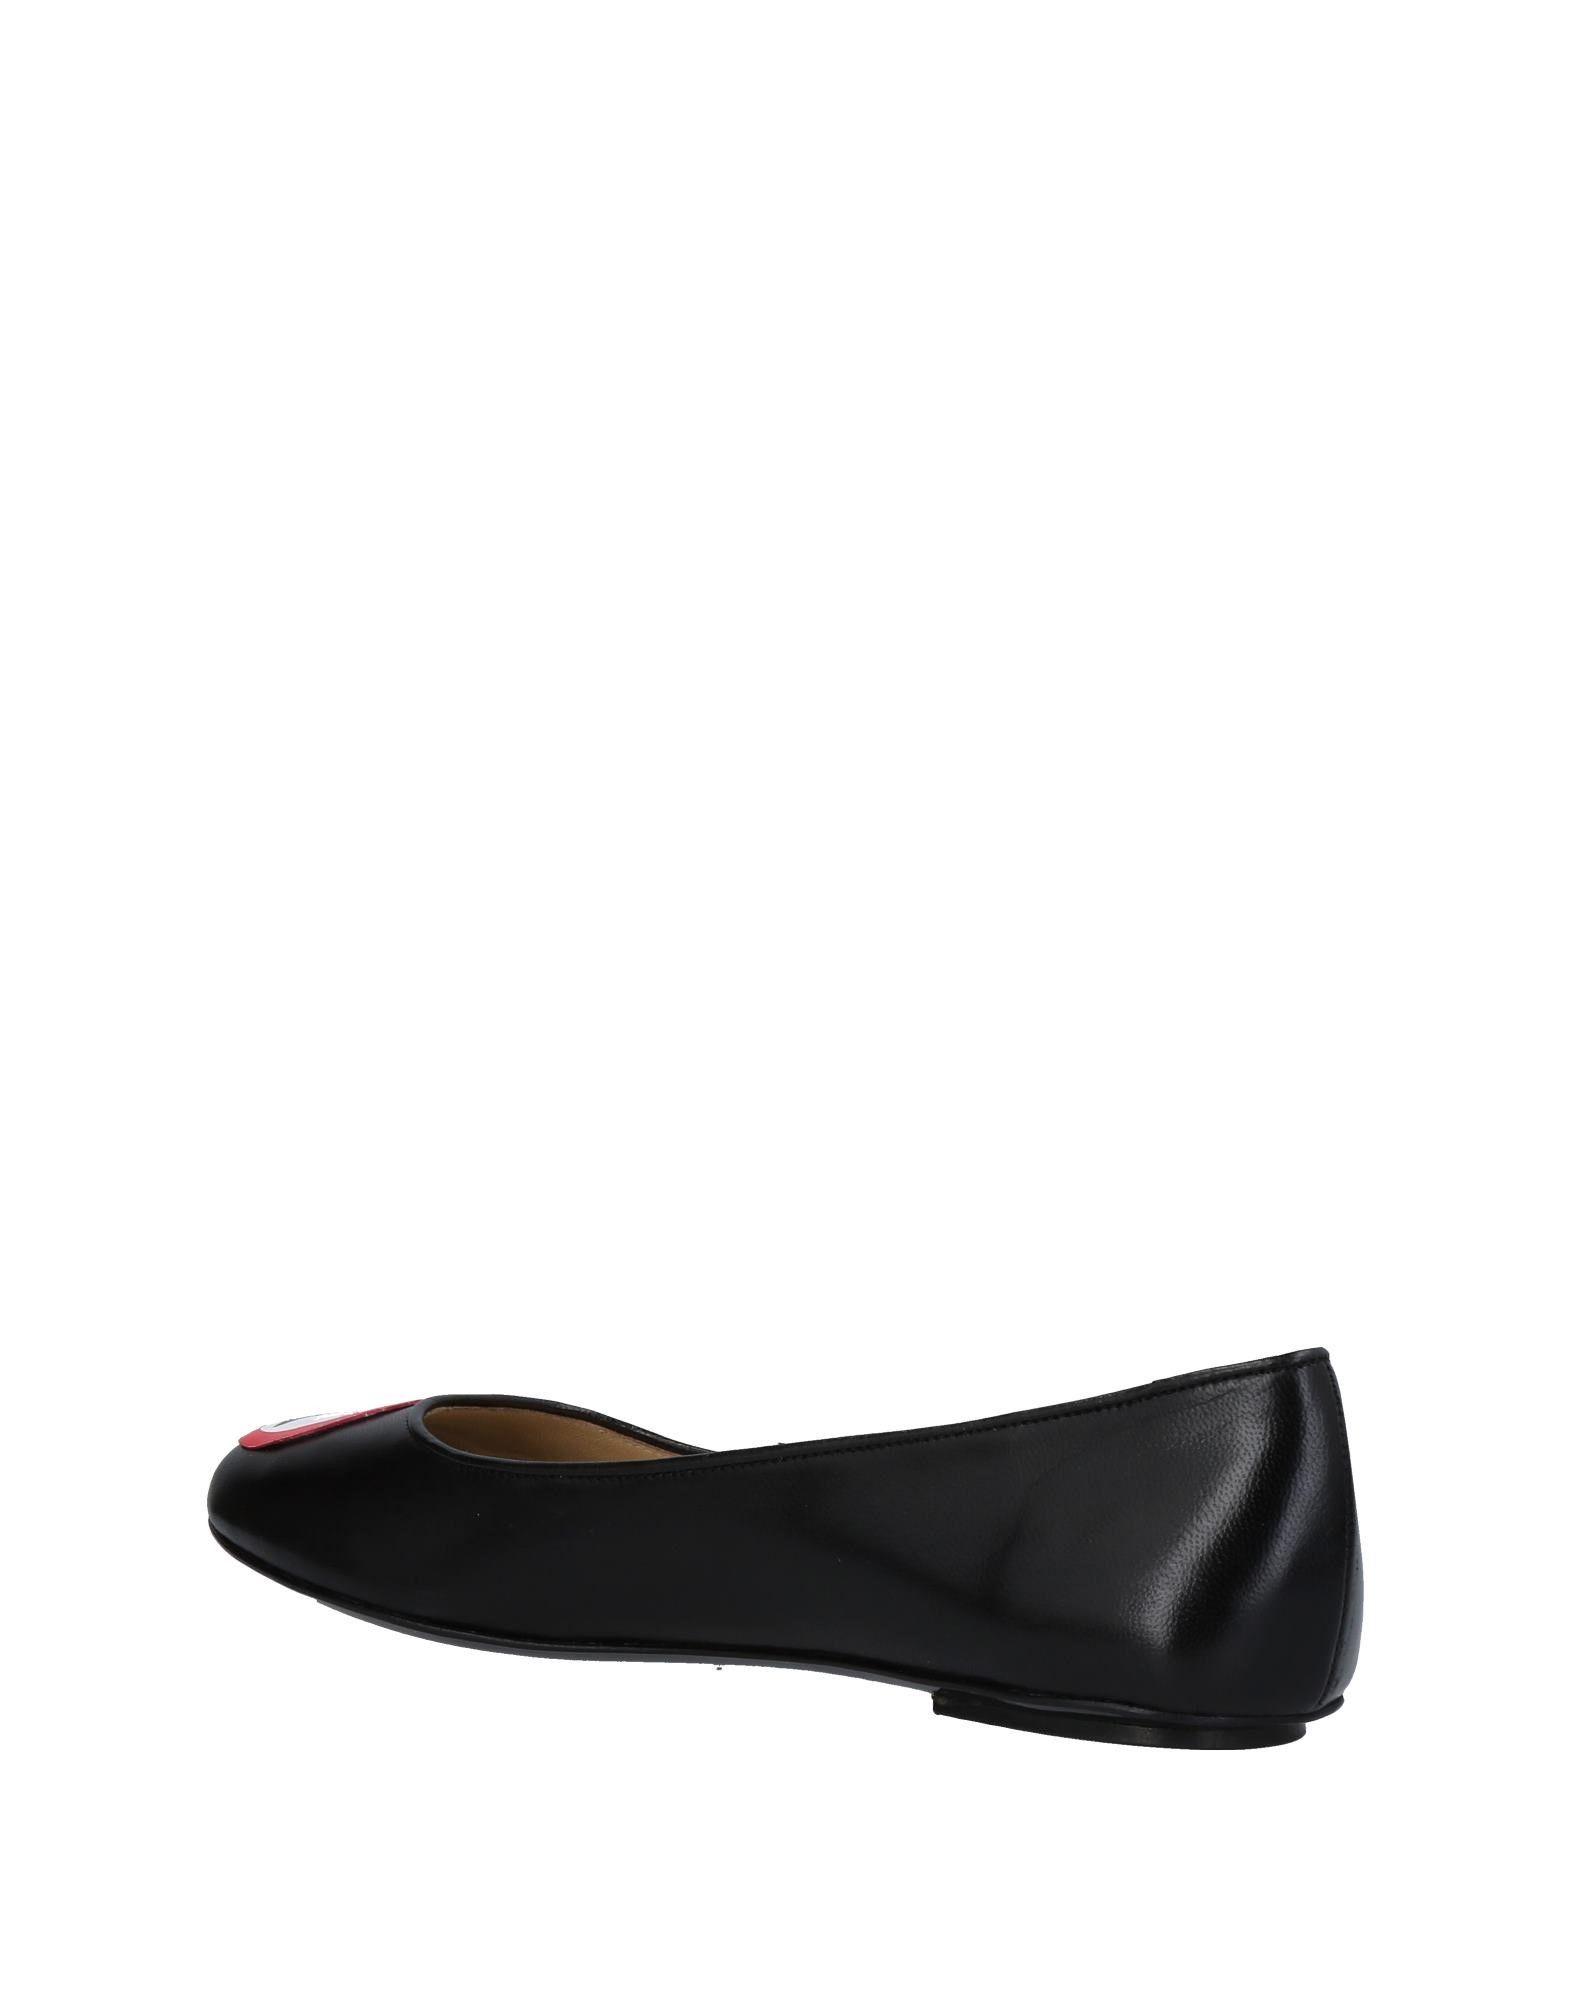 Stilvolle billige Schuhe Moschino Ballerinas 11416939FF Damen  11416939FF Ballerinas 3240e7